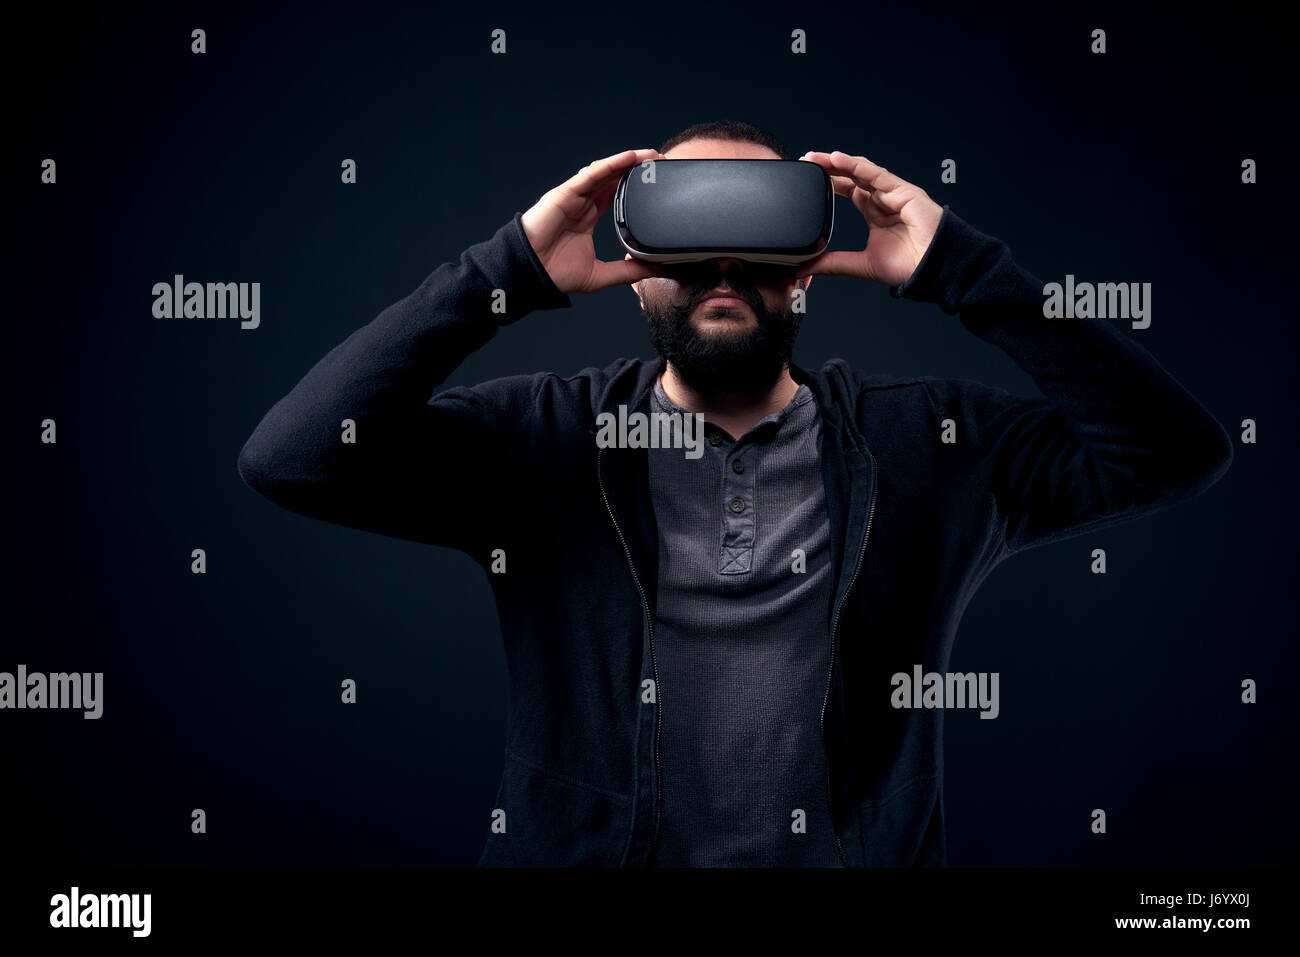 Young hipster hombre barbado portando gafas de realidad virtual. fondo negro studio concepto vr Imagen De Stock